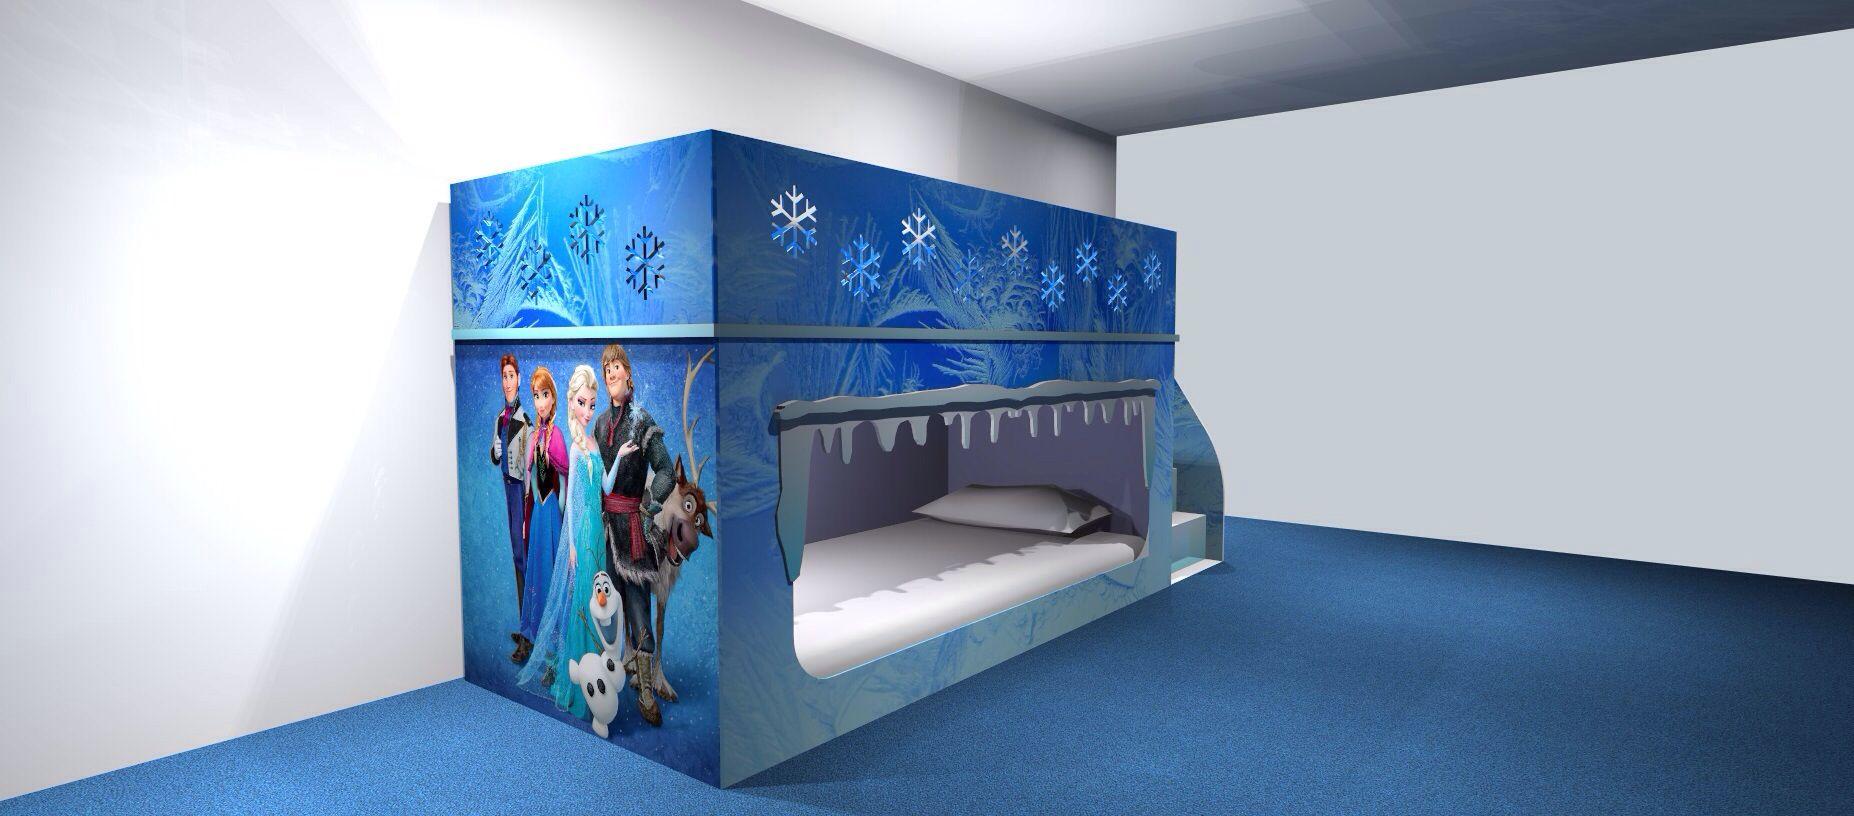 Frozen Inspired Bunkbed Www Dreamcraftfurniture Co Uk Frozen Bedroom Childrens Furniture Diy Furniture Bedroom Luxury frozen room pictures